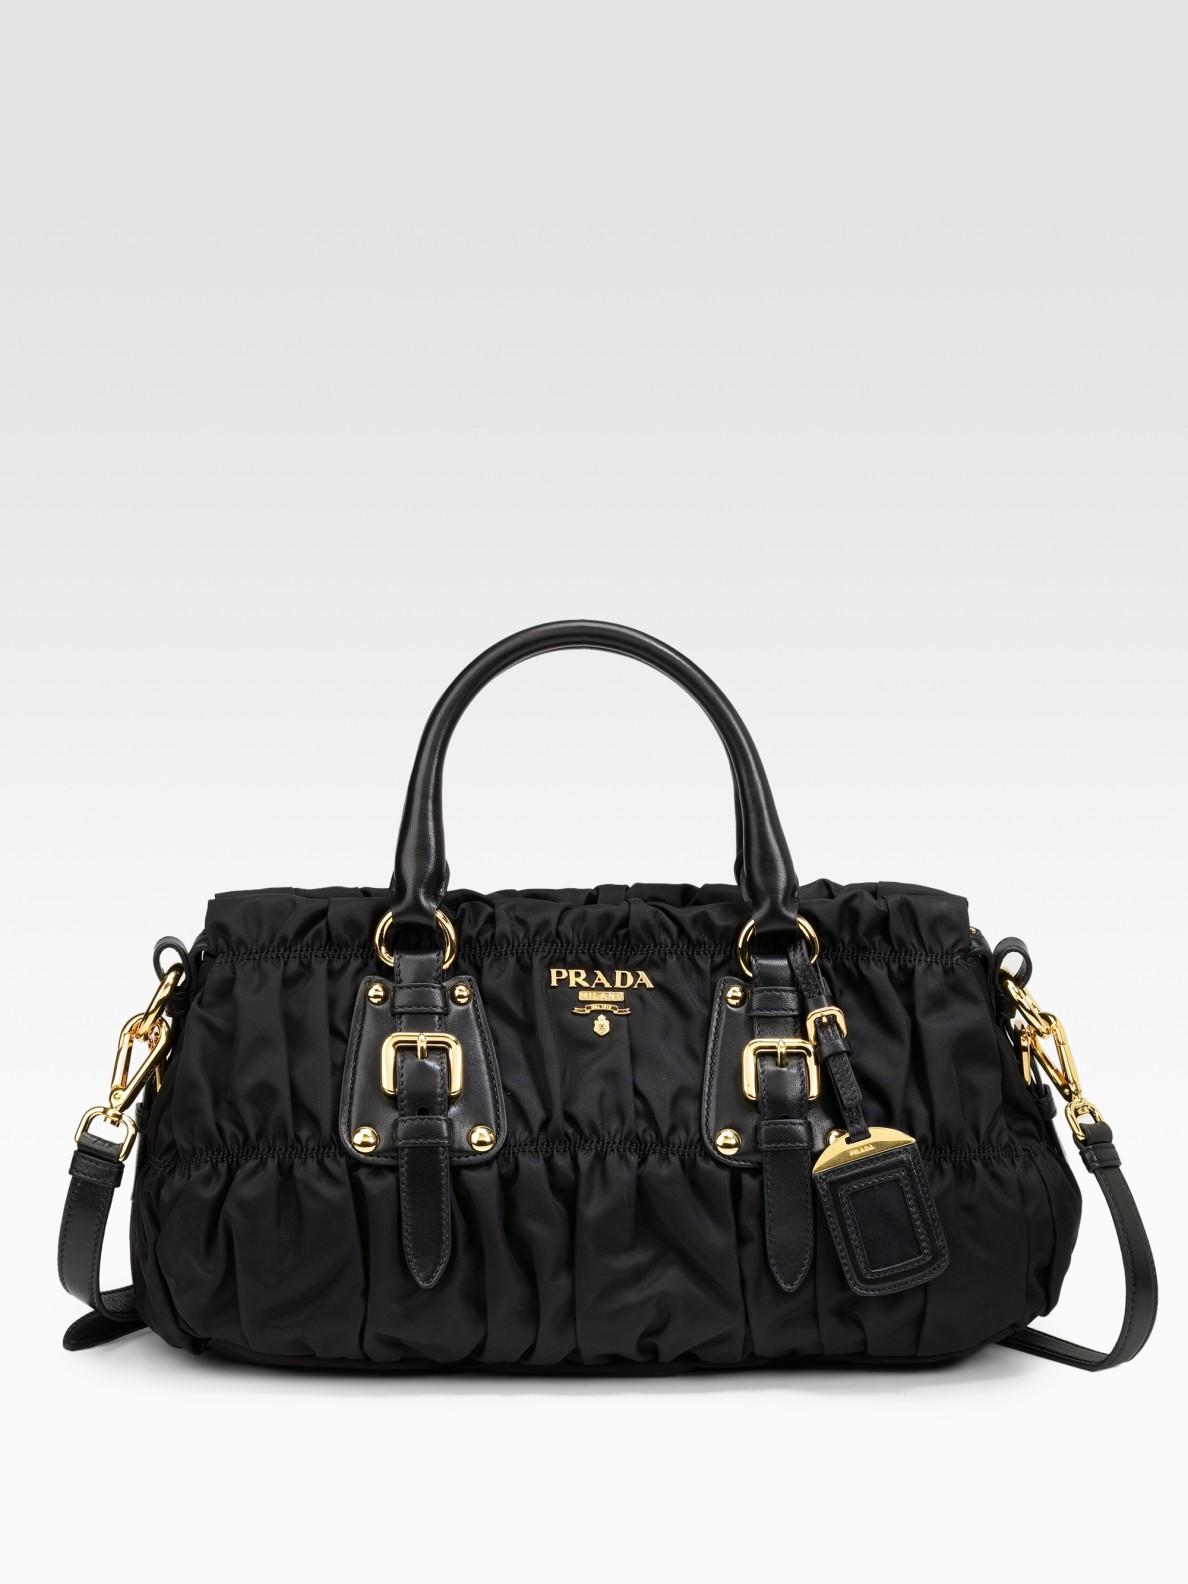 afe3f6a638be ... sale lyst prada tessuto gaufre top handle bag in black 94bac e21c2